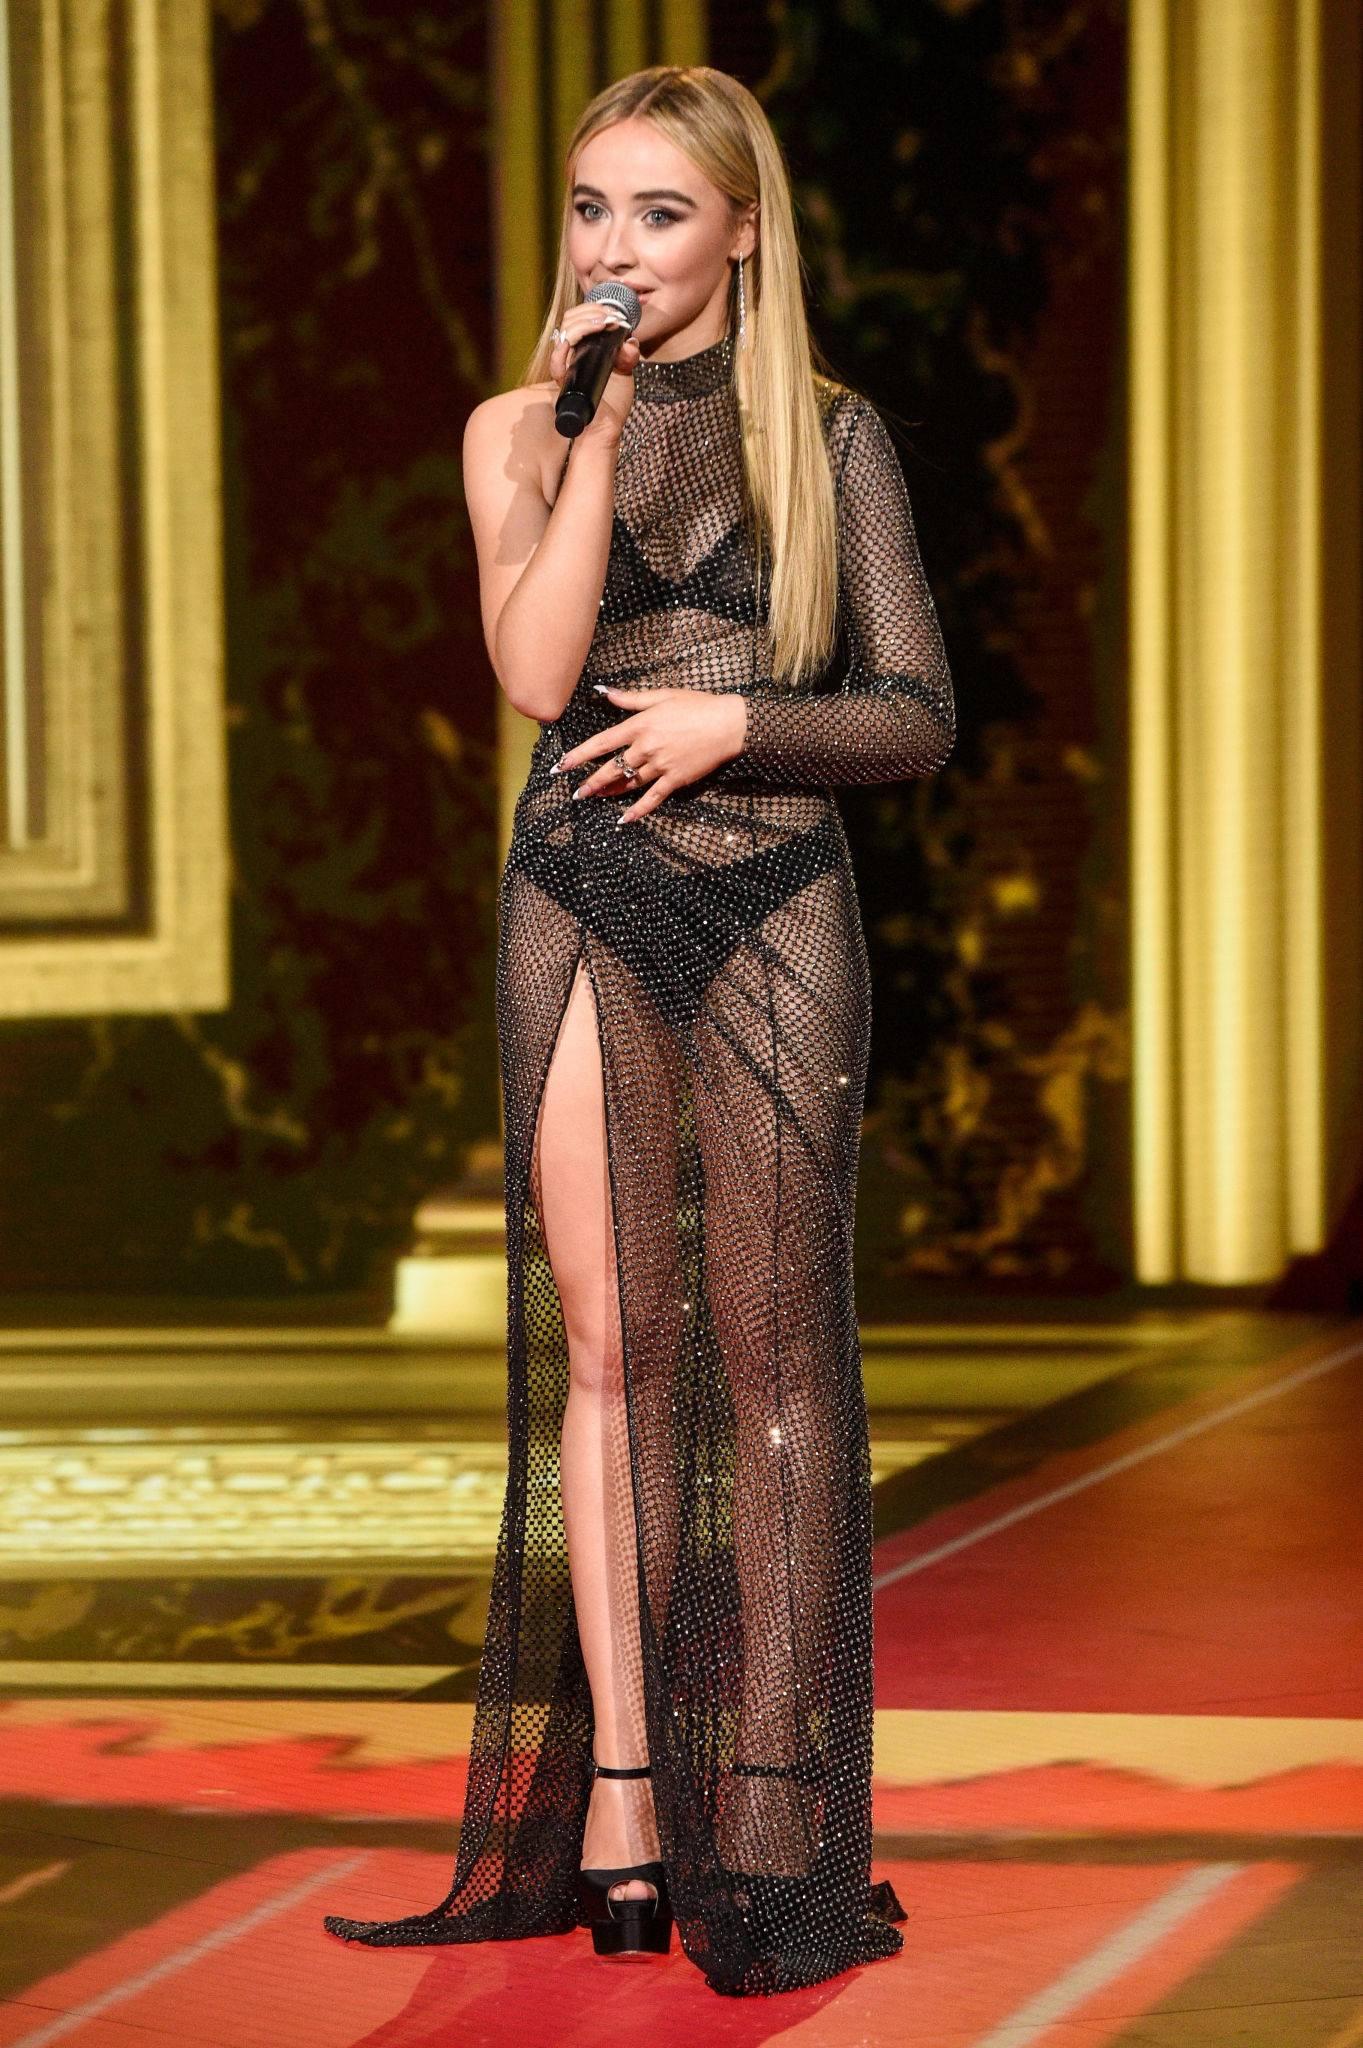 Sabrina Carpenter In Sheer Dress